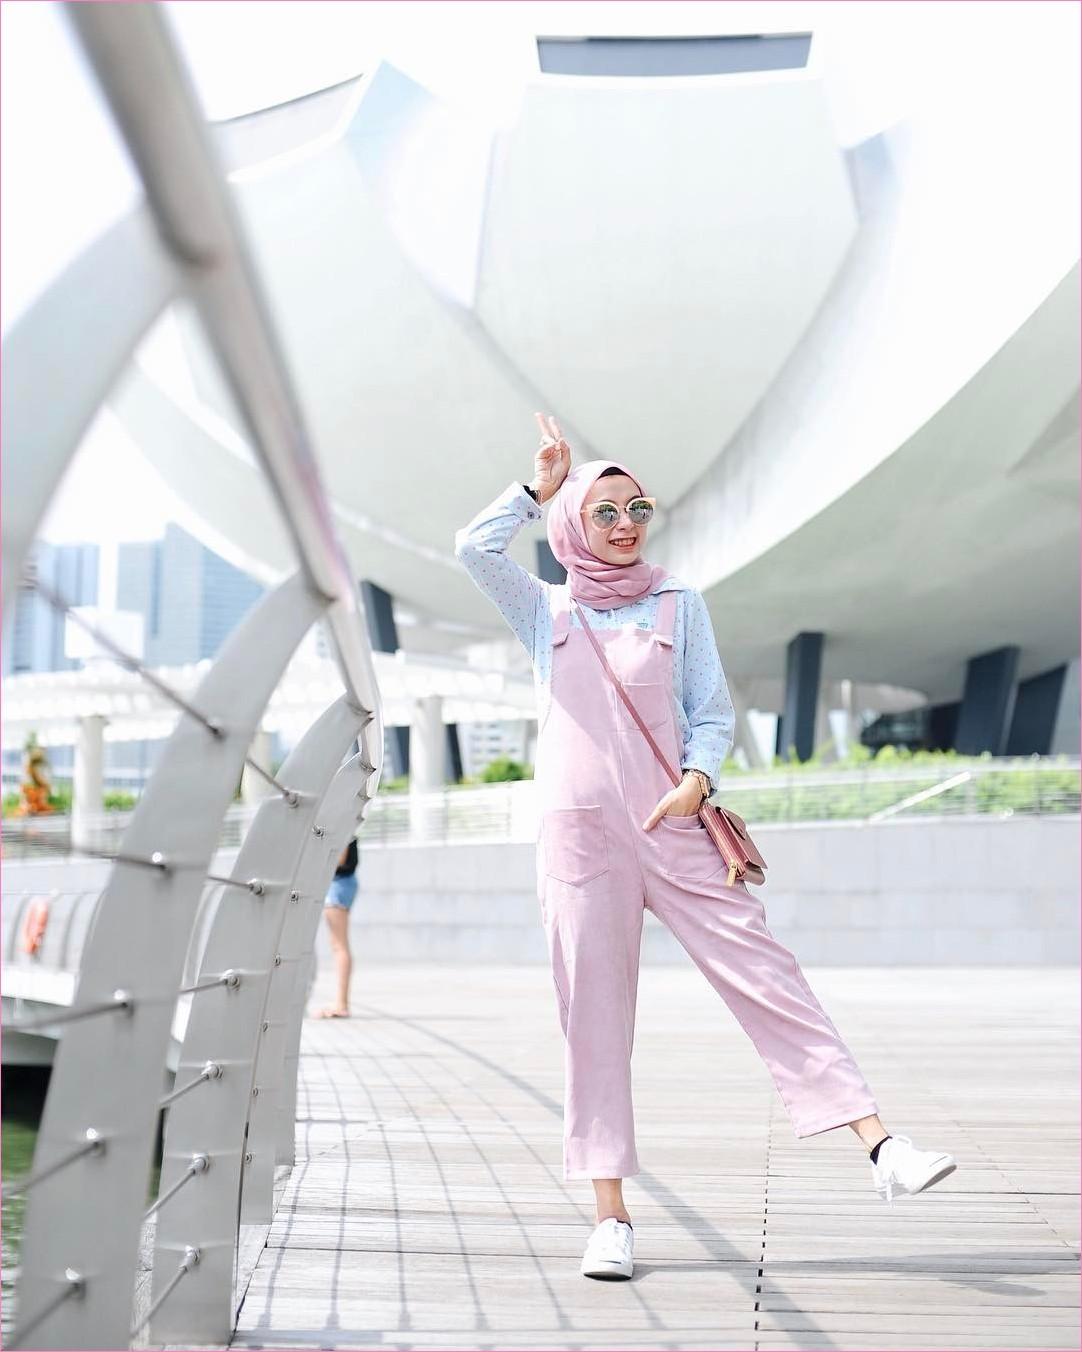 Mix And Match Outfit Baju Luaran (Inner) 2018 Ala Selebgram overall jumpsuit baju kodok baby pink segiempat hijab square pink pastel kacamata blouse kemeja biru muda pastel kets sneakers putih kaos kaki hitam jam tangan slingbags ootd